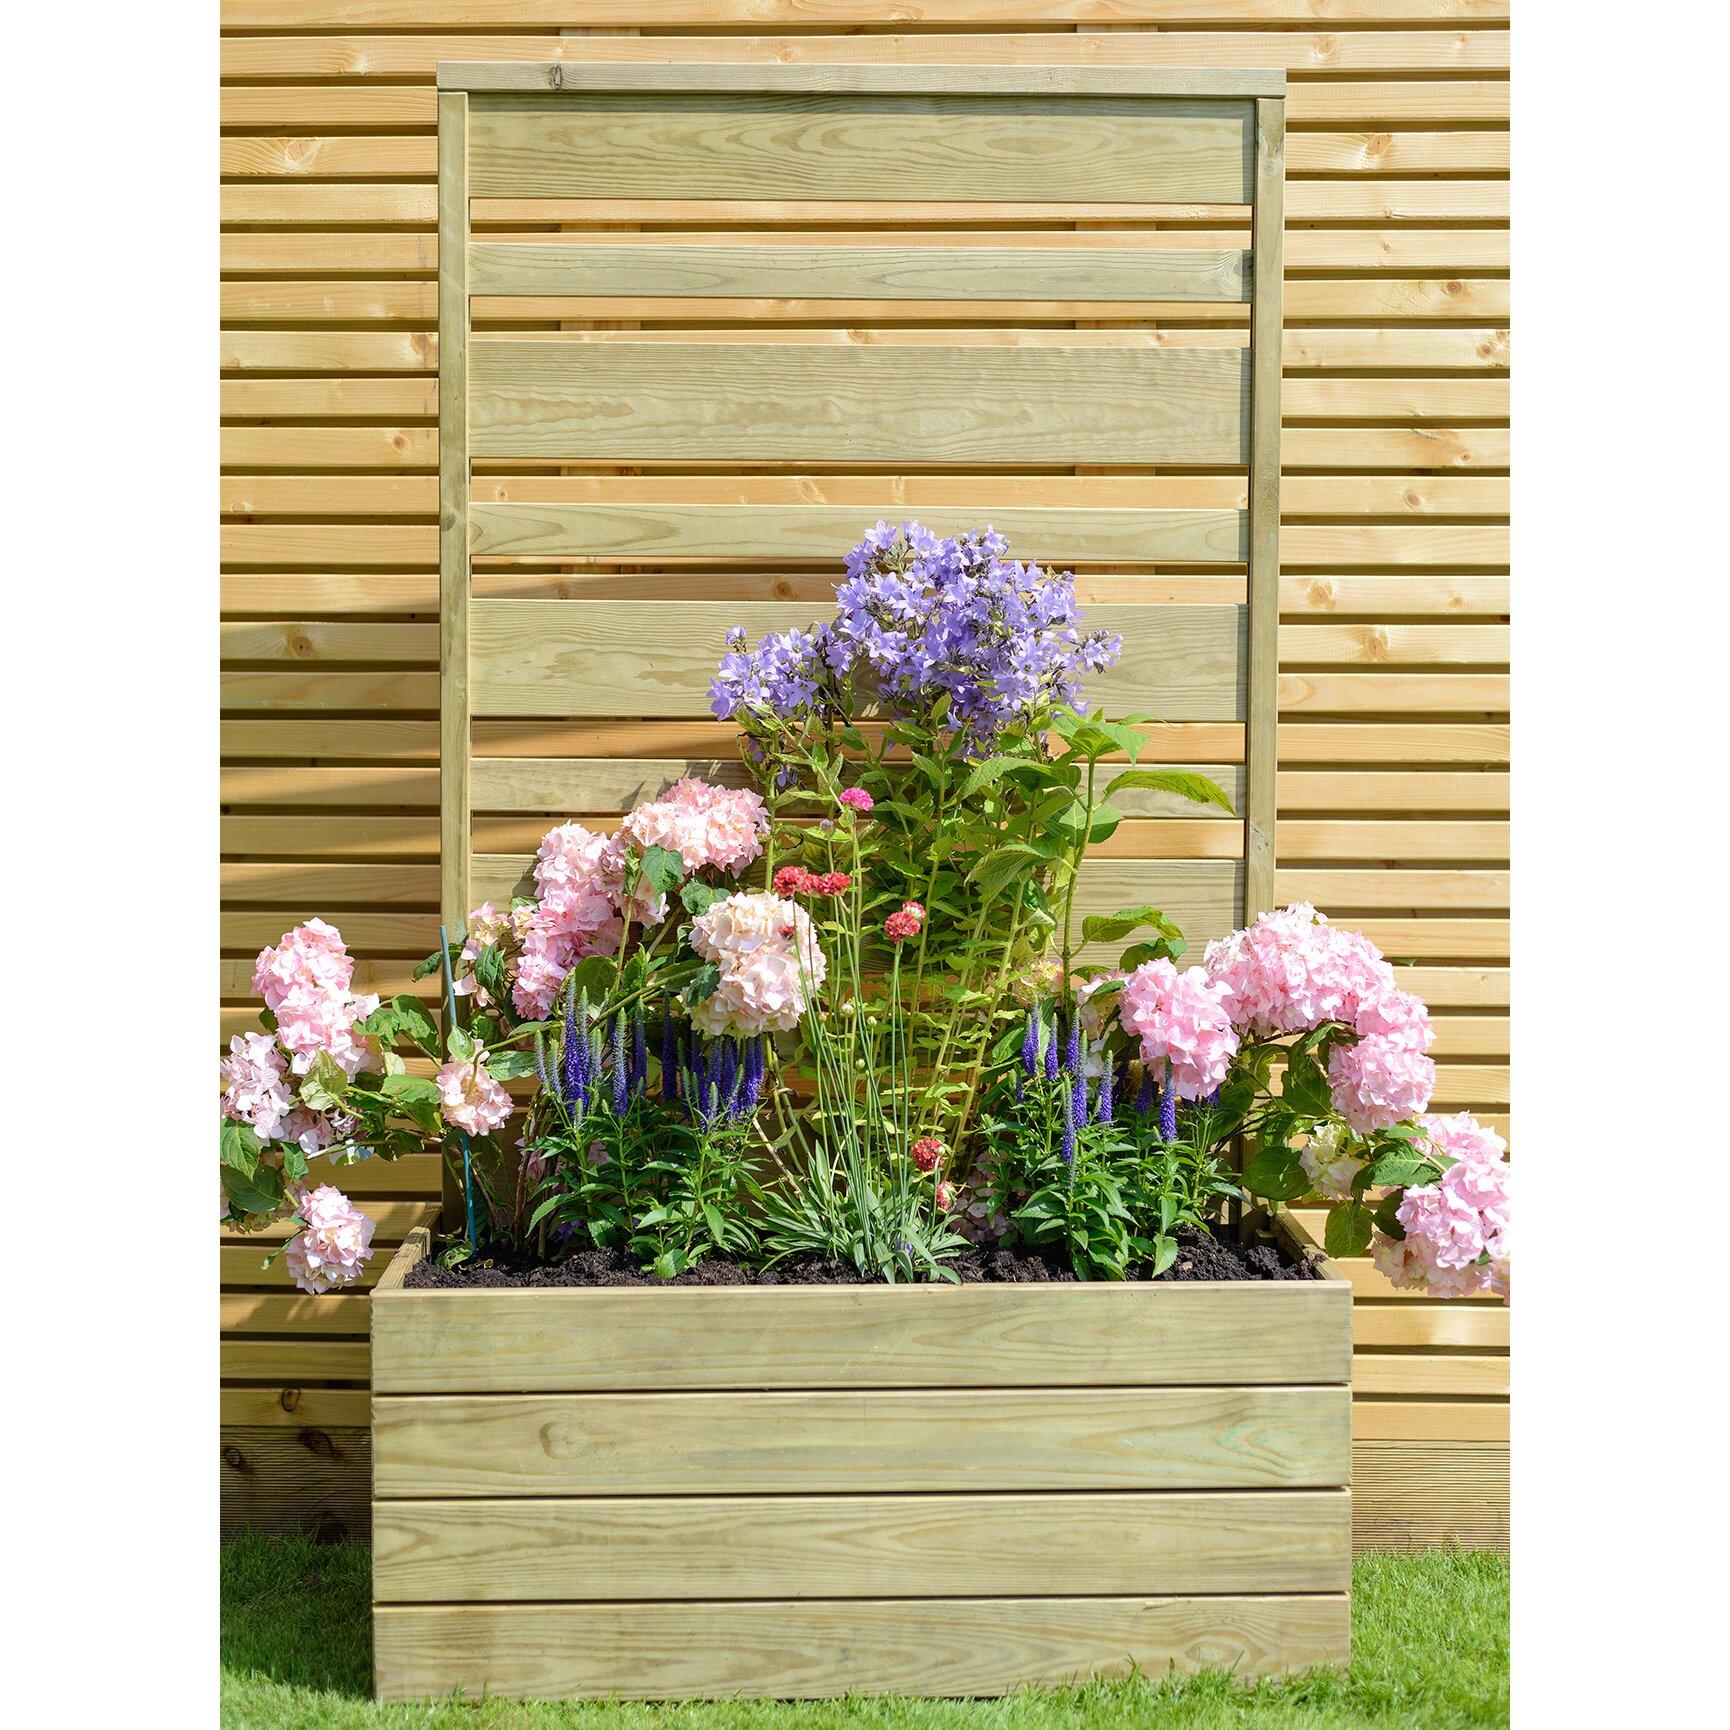 Grange fencing urban rectangular planter wayfair uk for Urban glass fencing